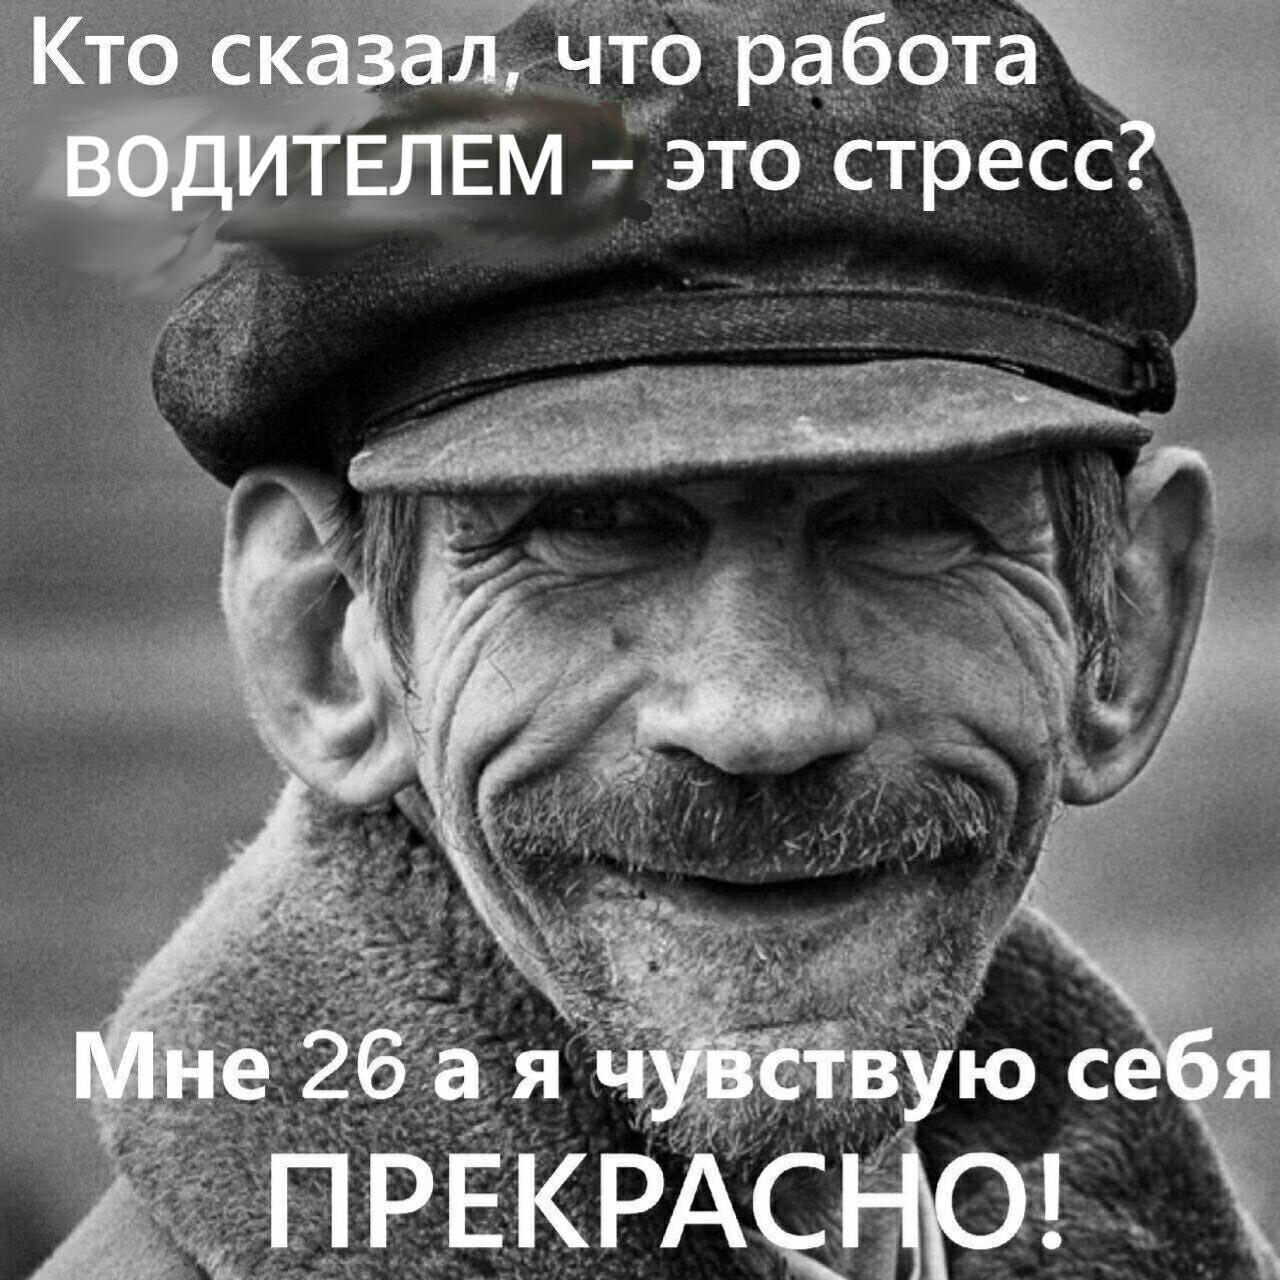 http://s7.uploads.ru/ouPXr.jpg